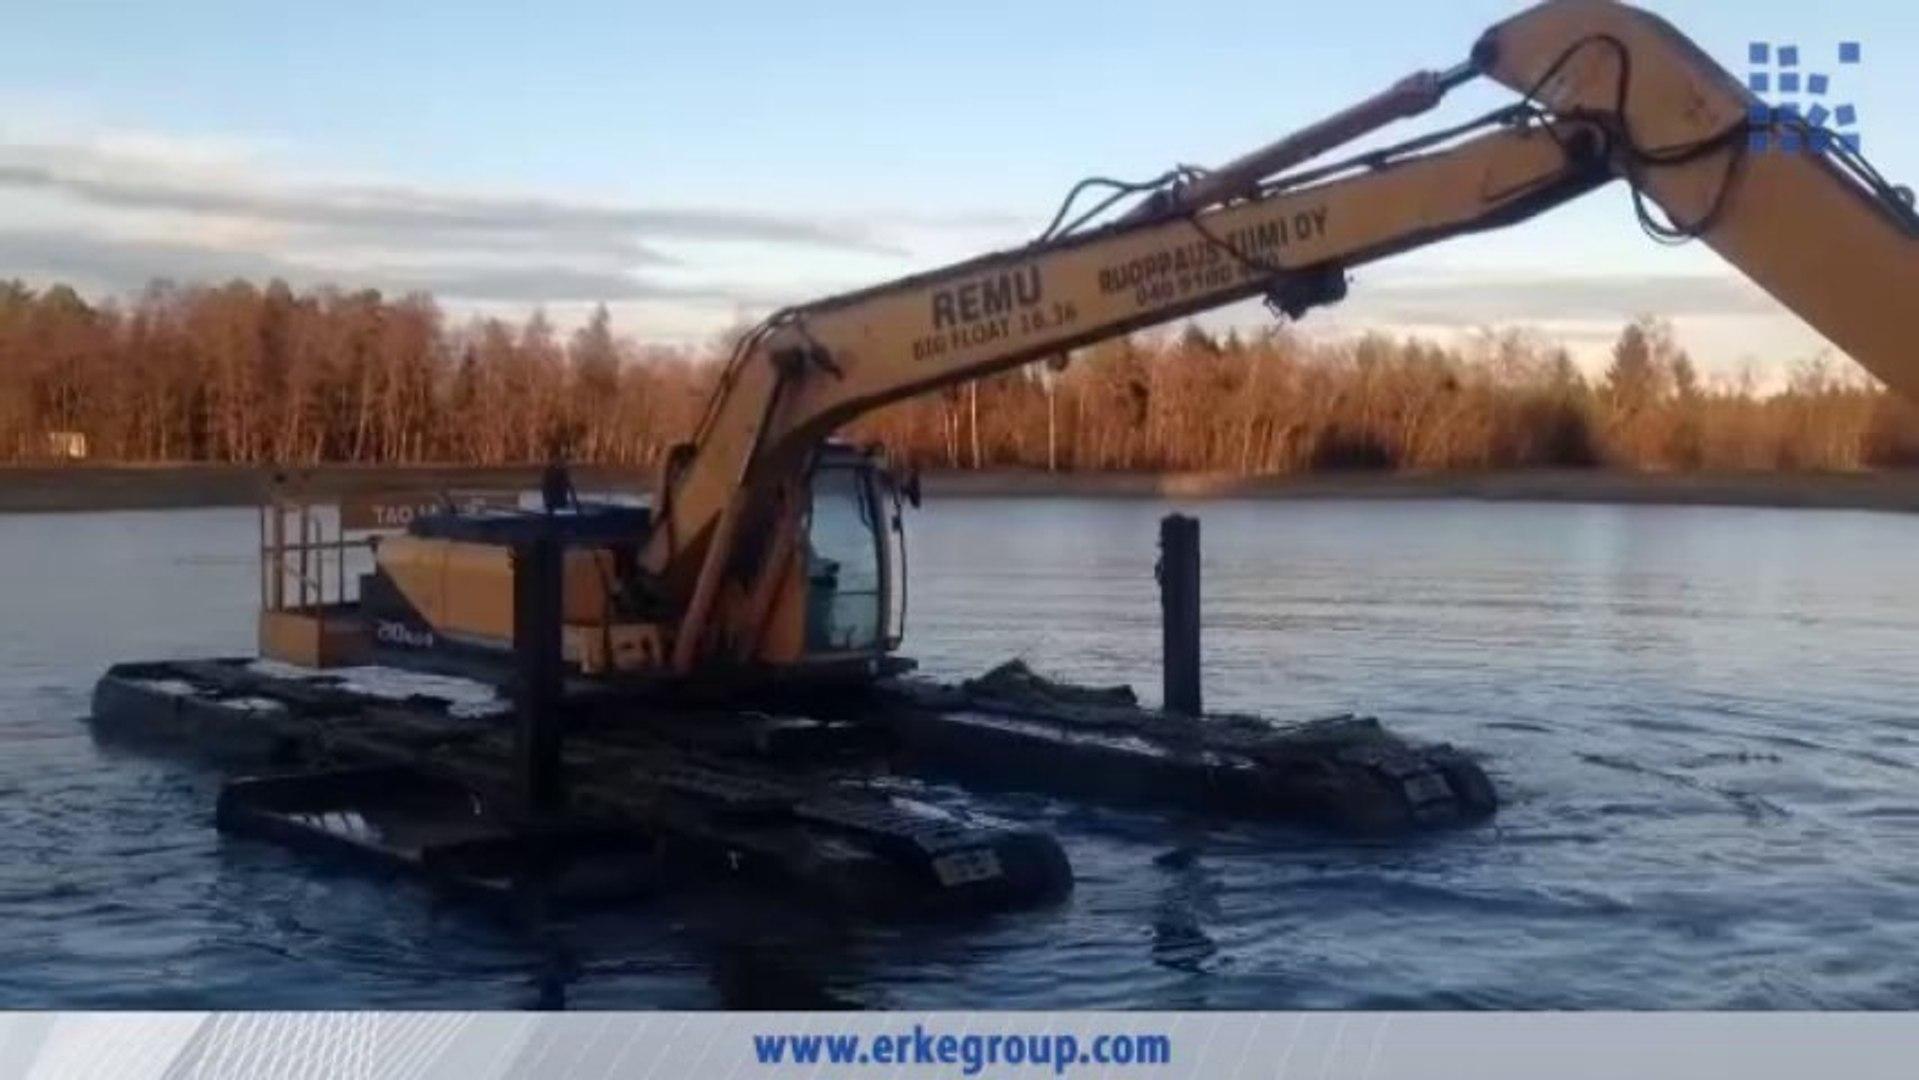 ERKE Dış Ticaret ltd., Big Float 16.36 Amphibious Excavator - River Cleaning - www.erkegroup.com